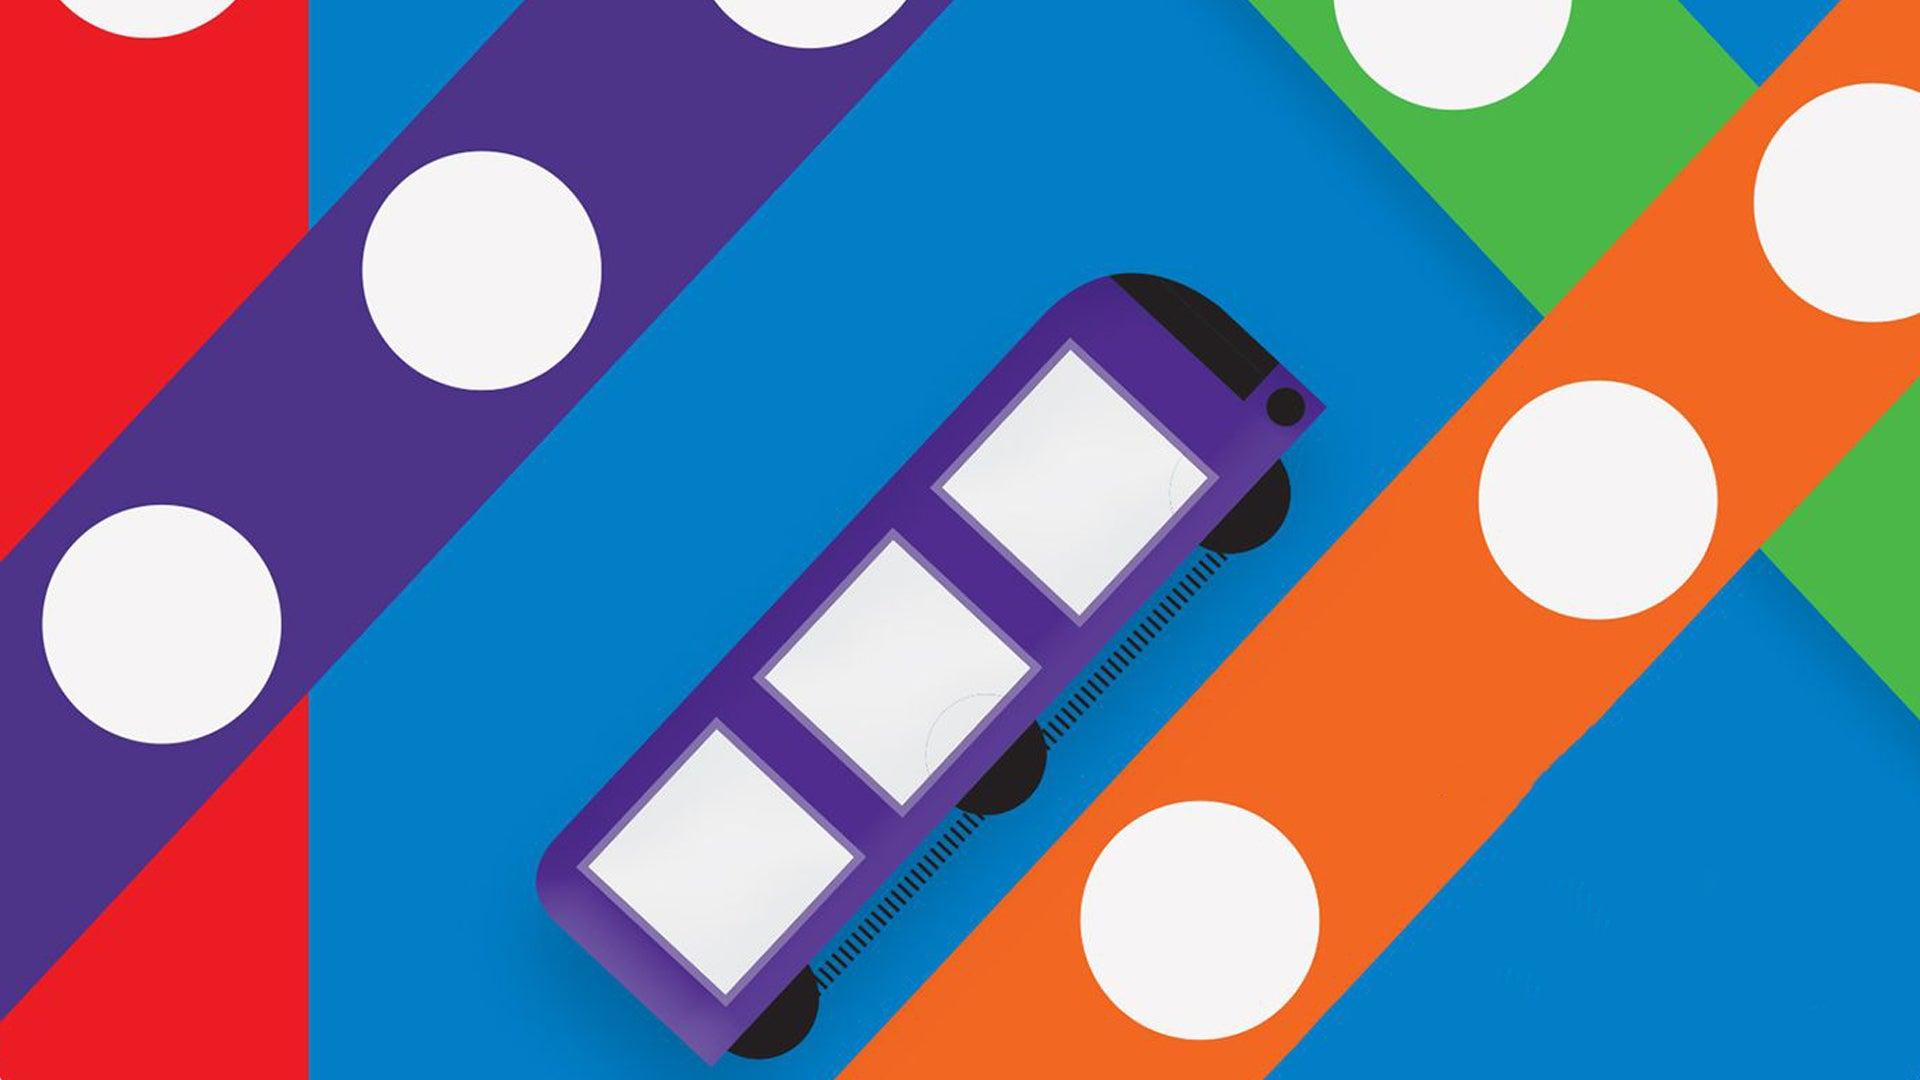 Metro X board game artwork